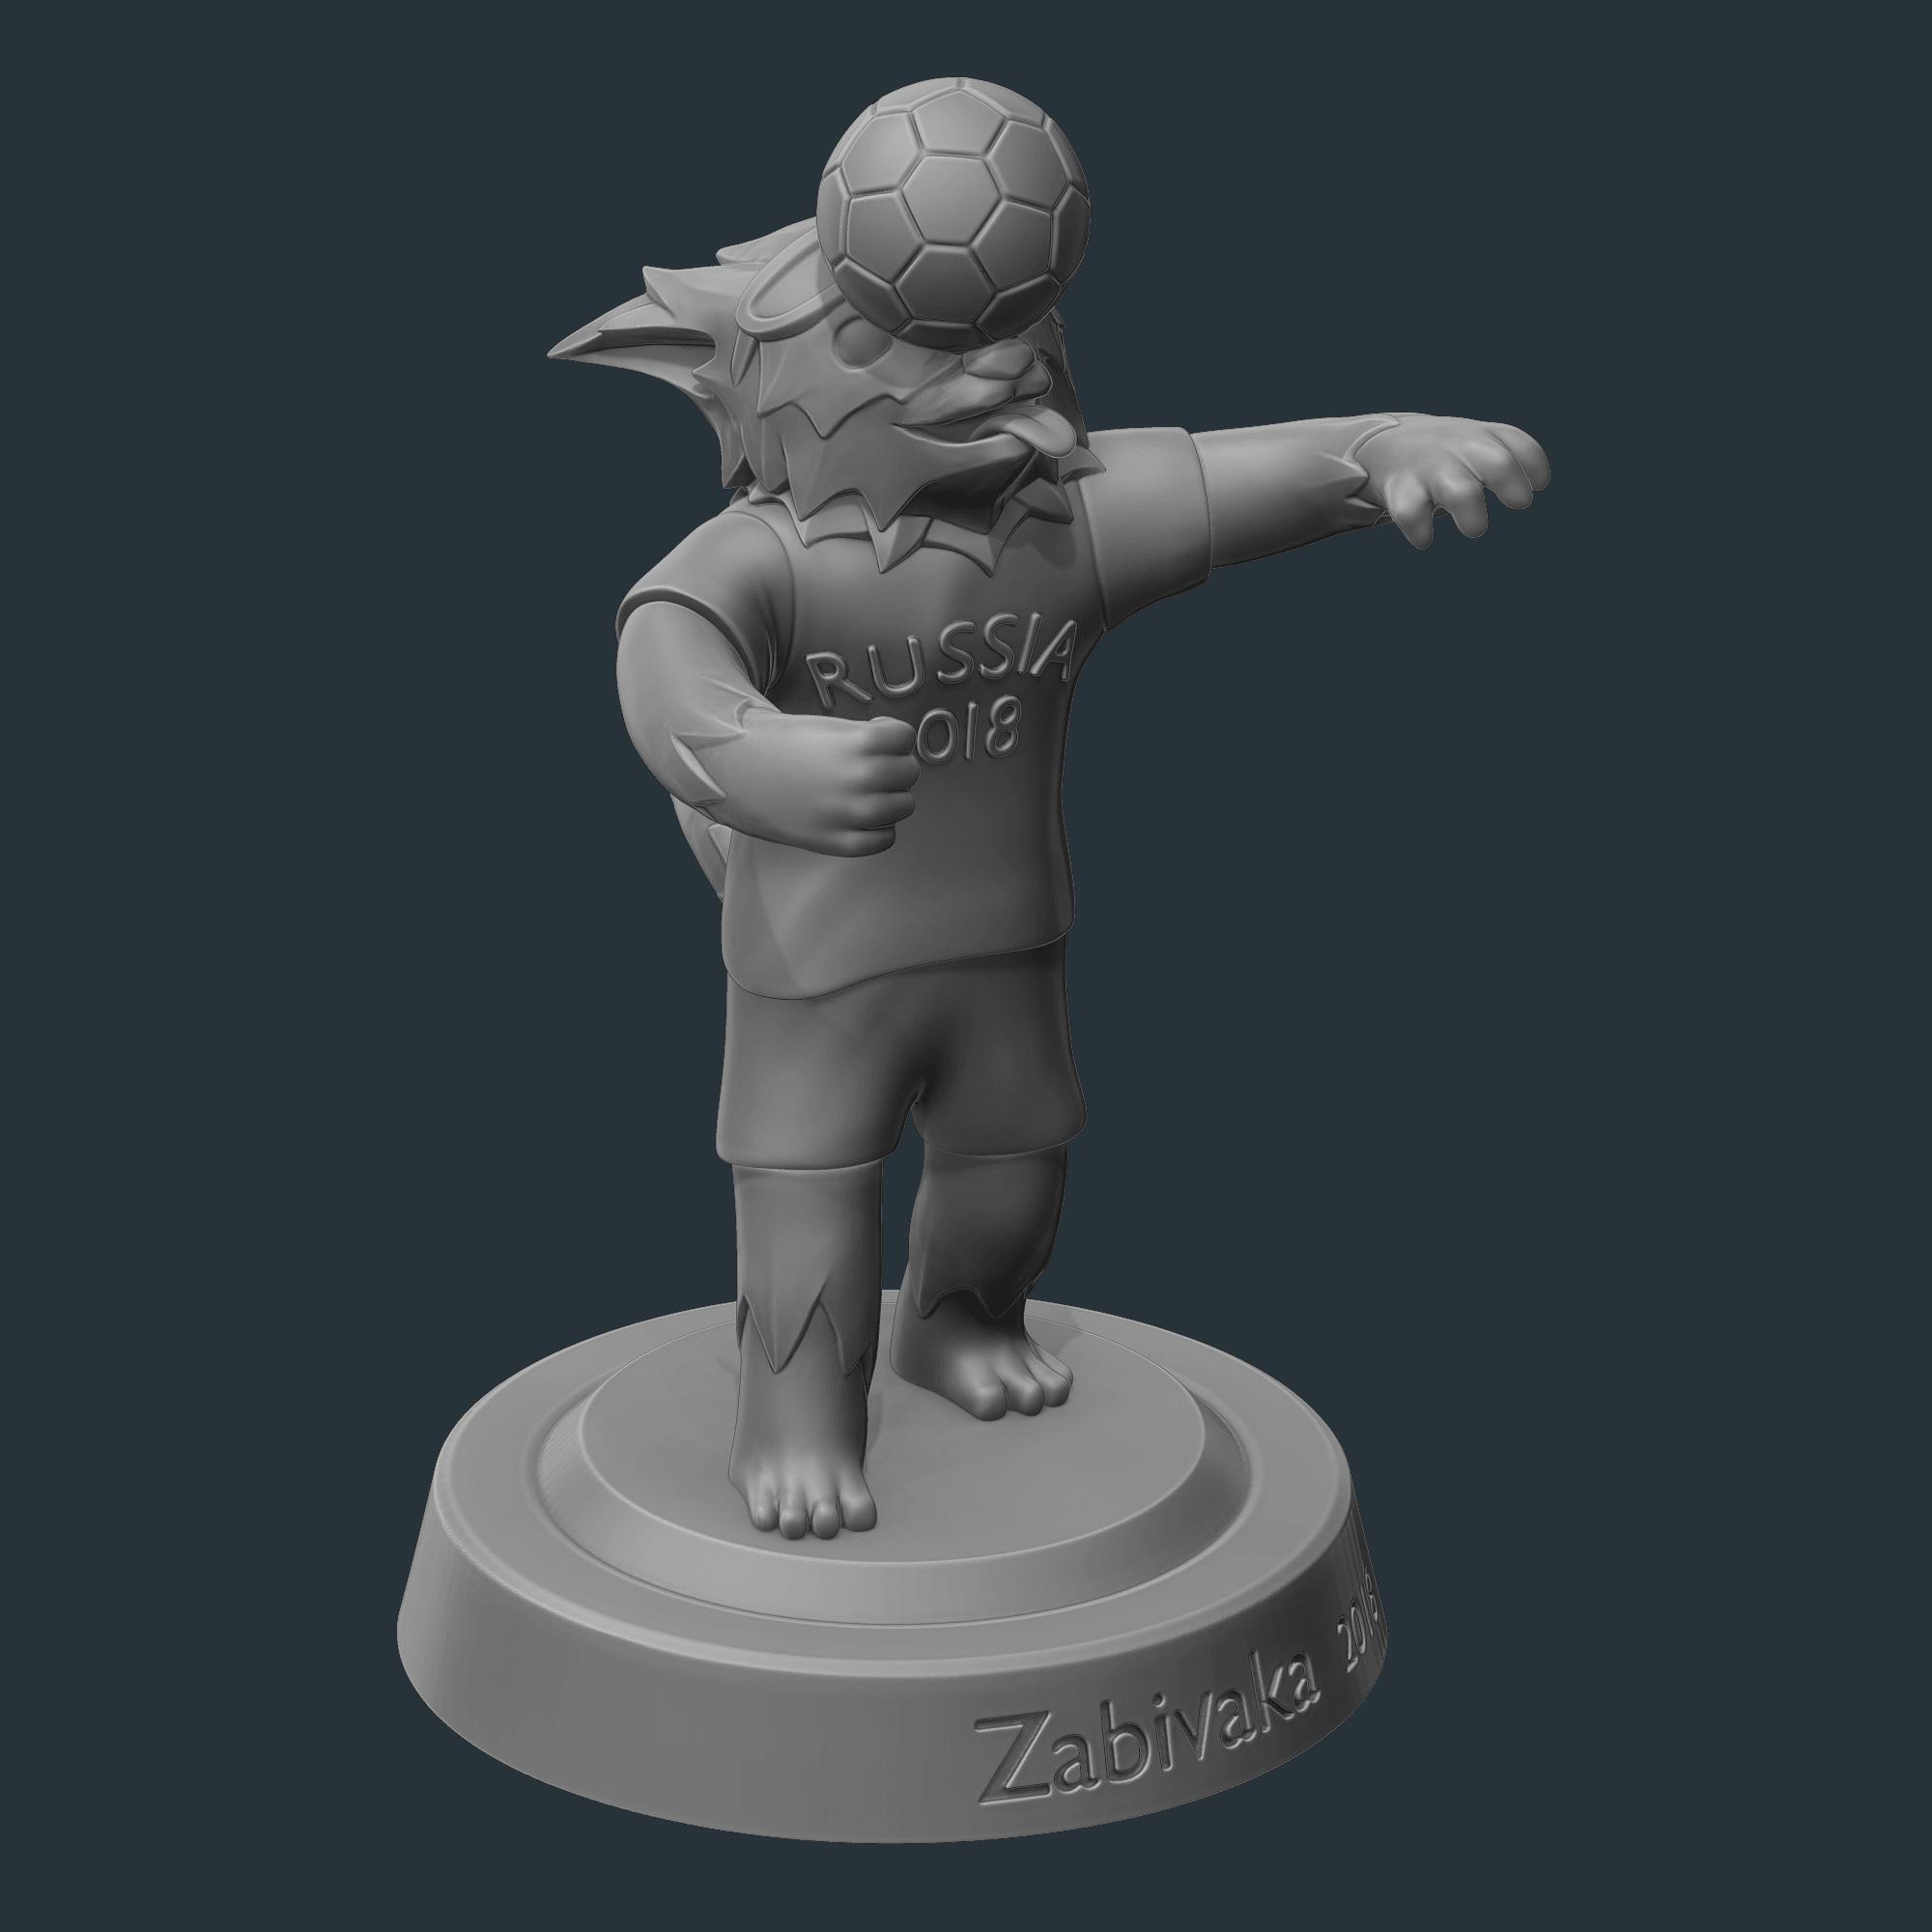 2.png Download OBJ file Zabivaka World Cup 2018 Mascot • 3D printer template, NoEvil116